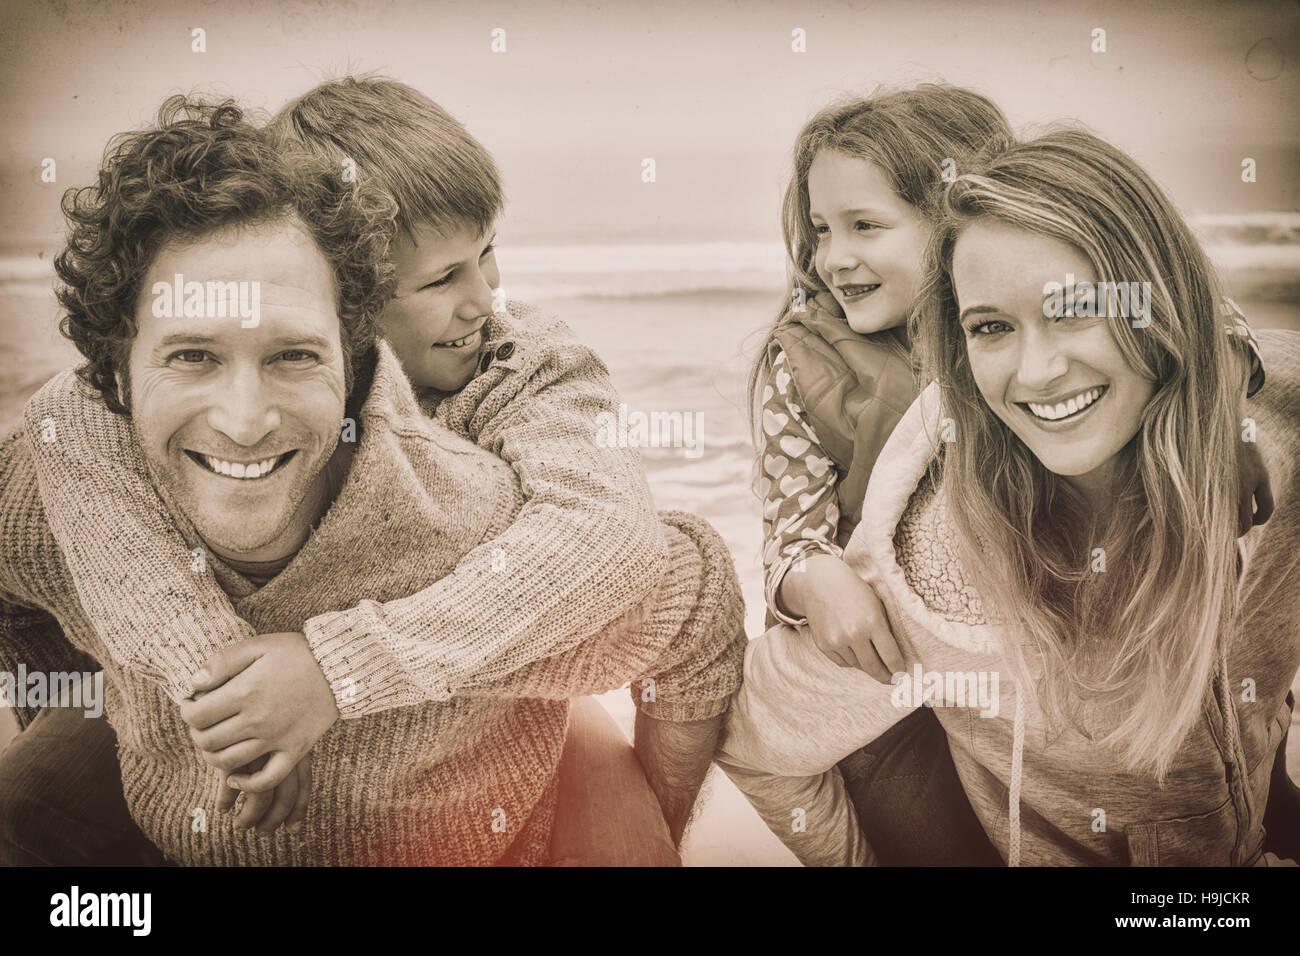 Happy couple piggybacking kids at beach - Stock Image